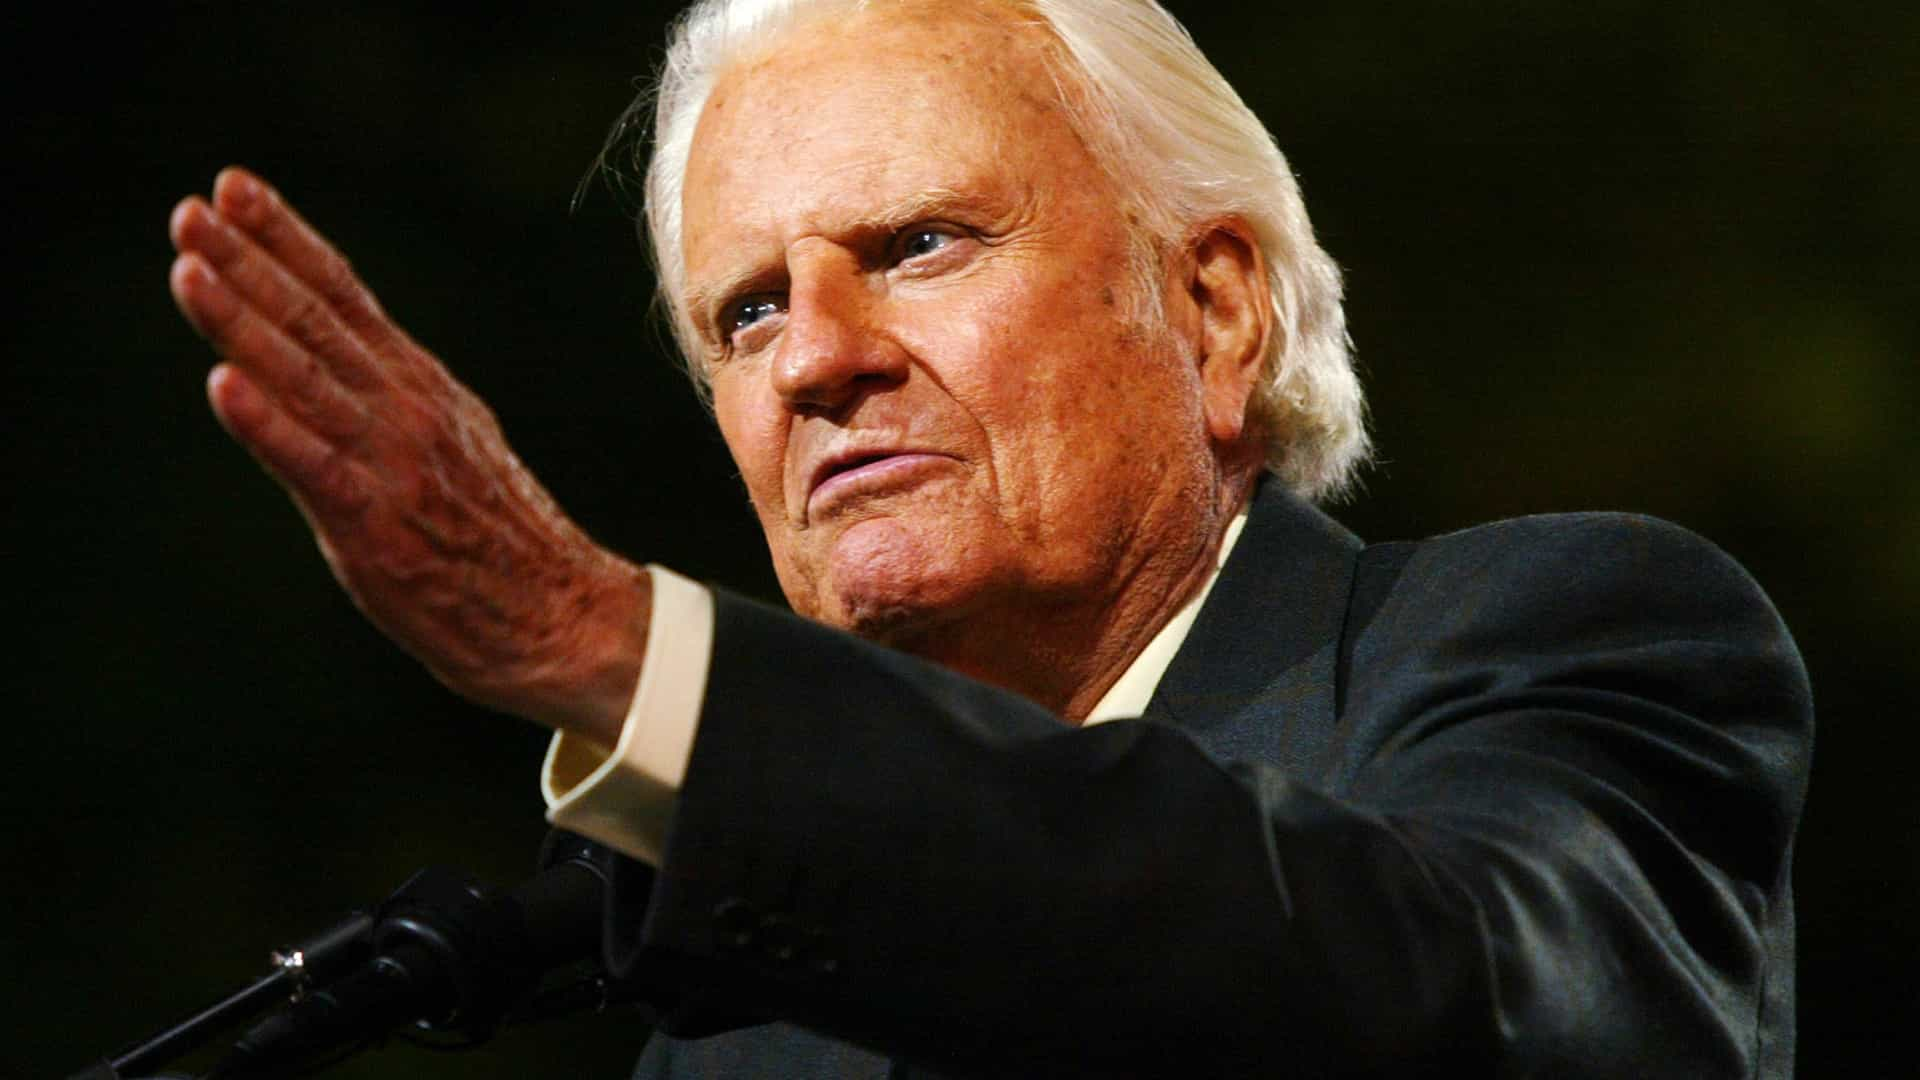 Morreu Billy Graham, pregador religioso e conselheiro de presidentes